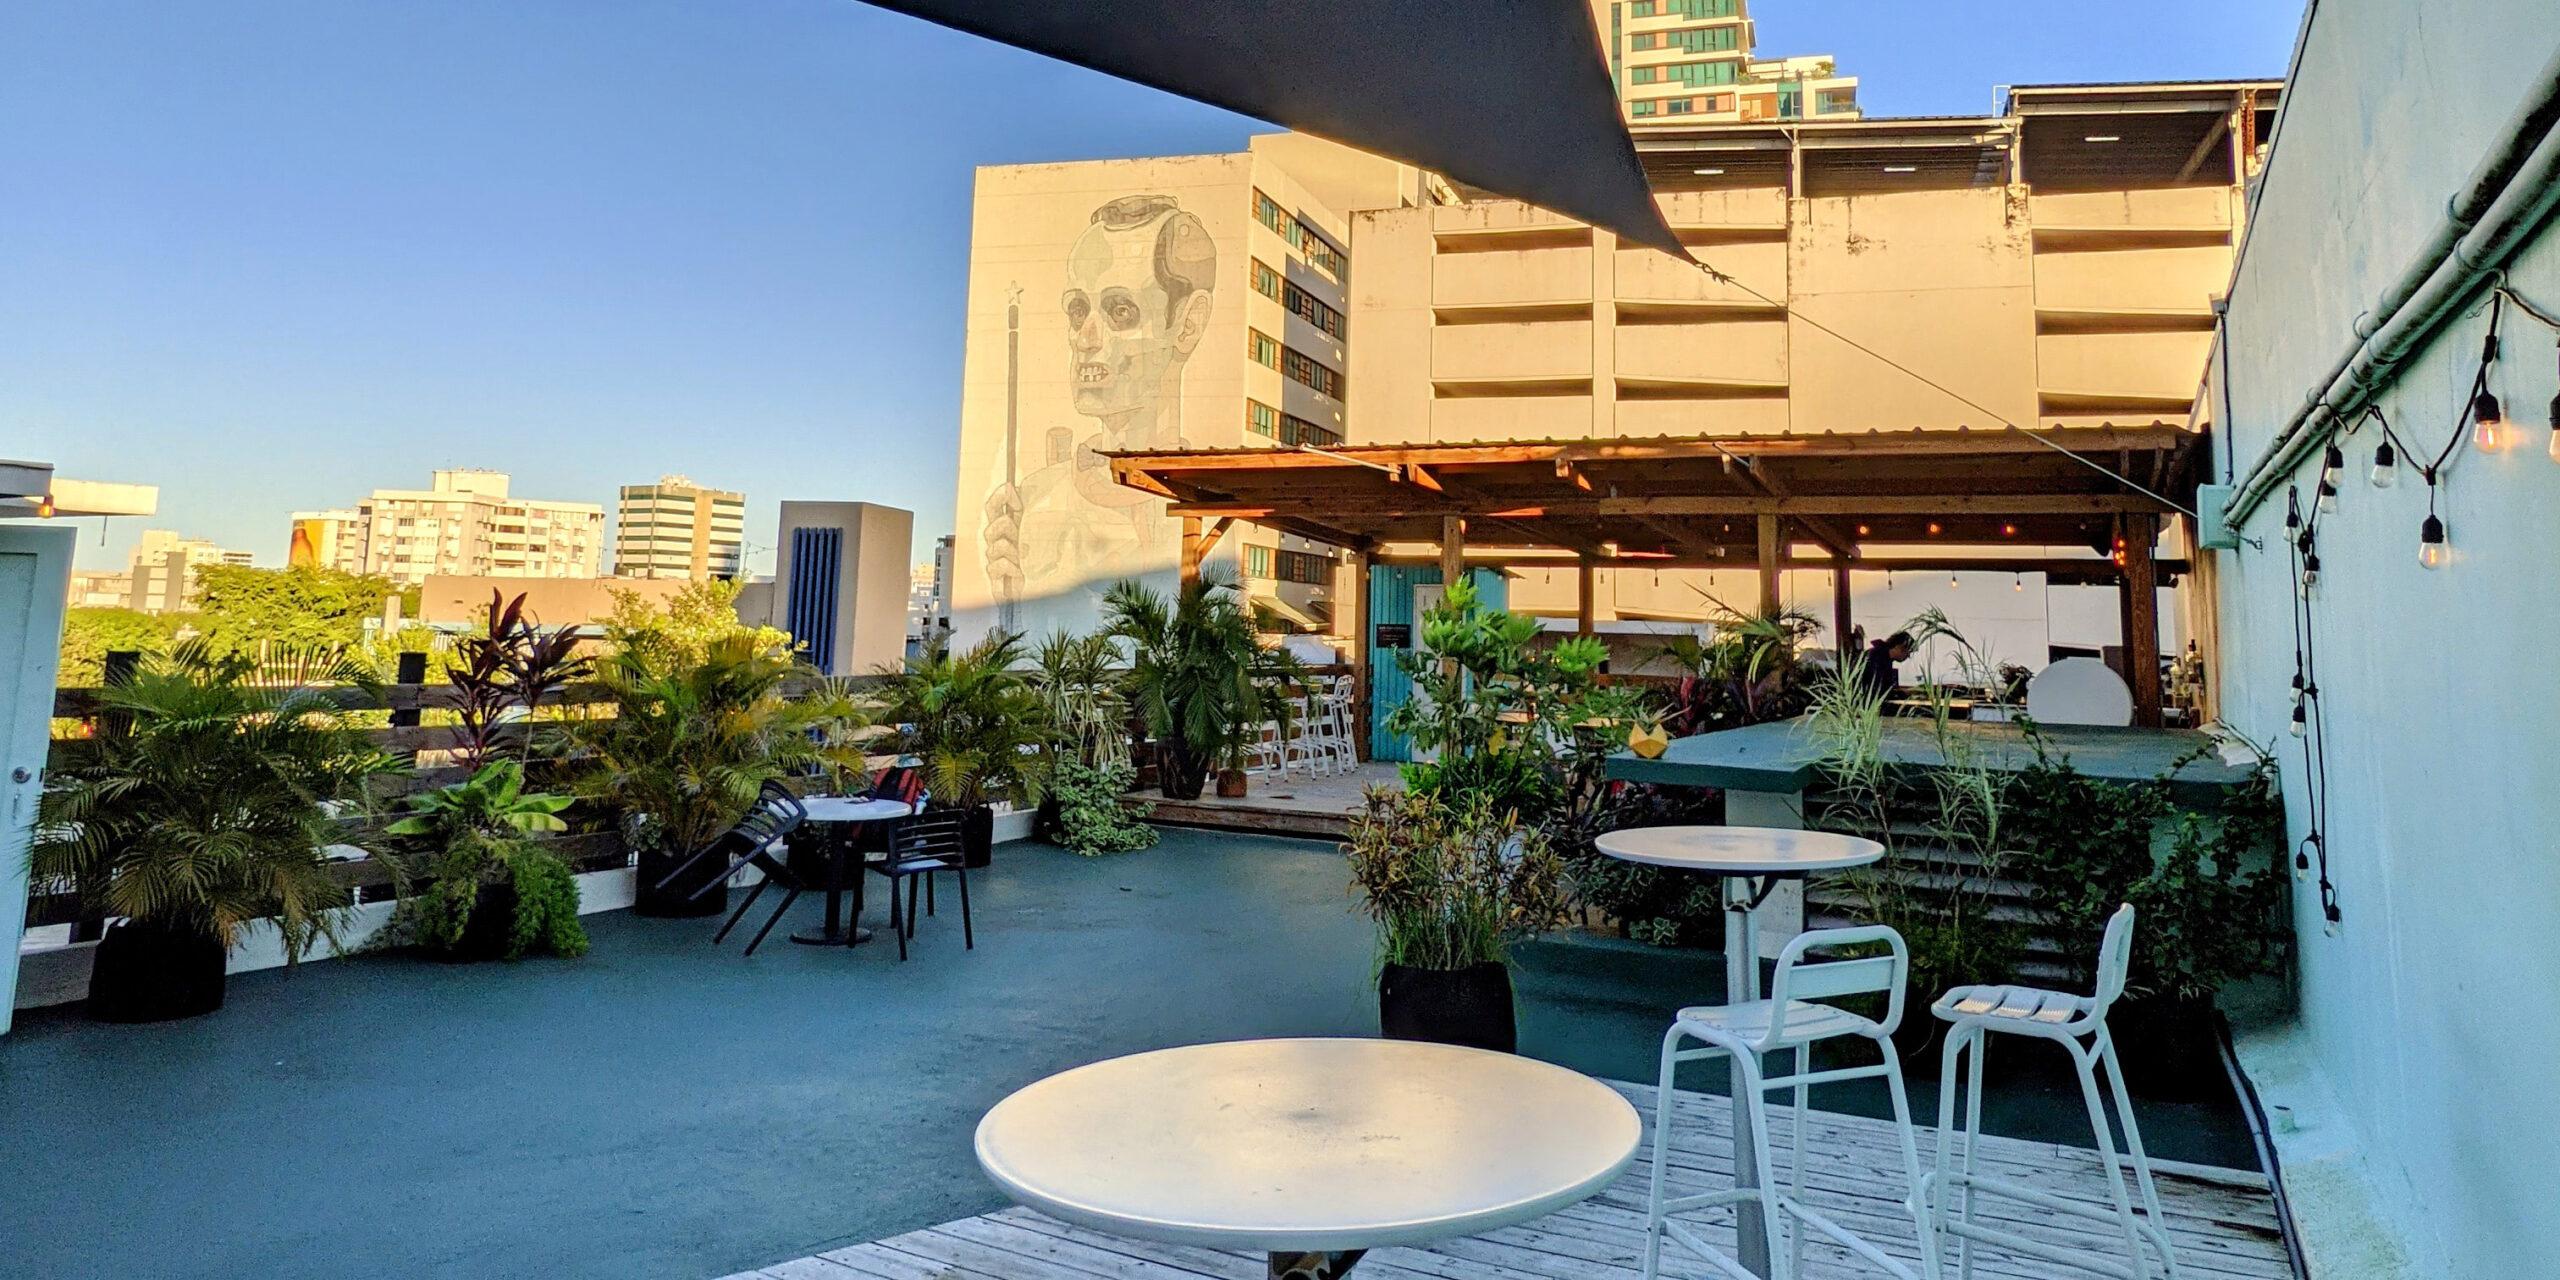 cocohaus-santurcia-hostel-rooftop-coworking